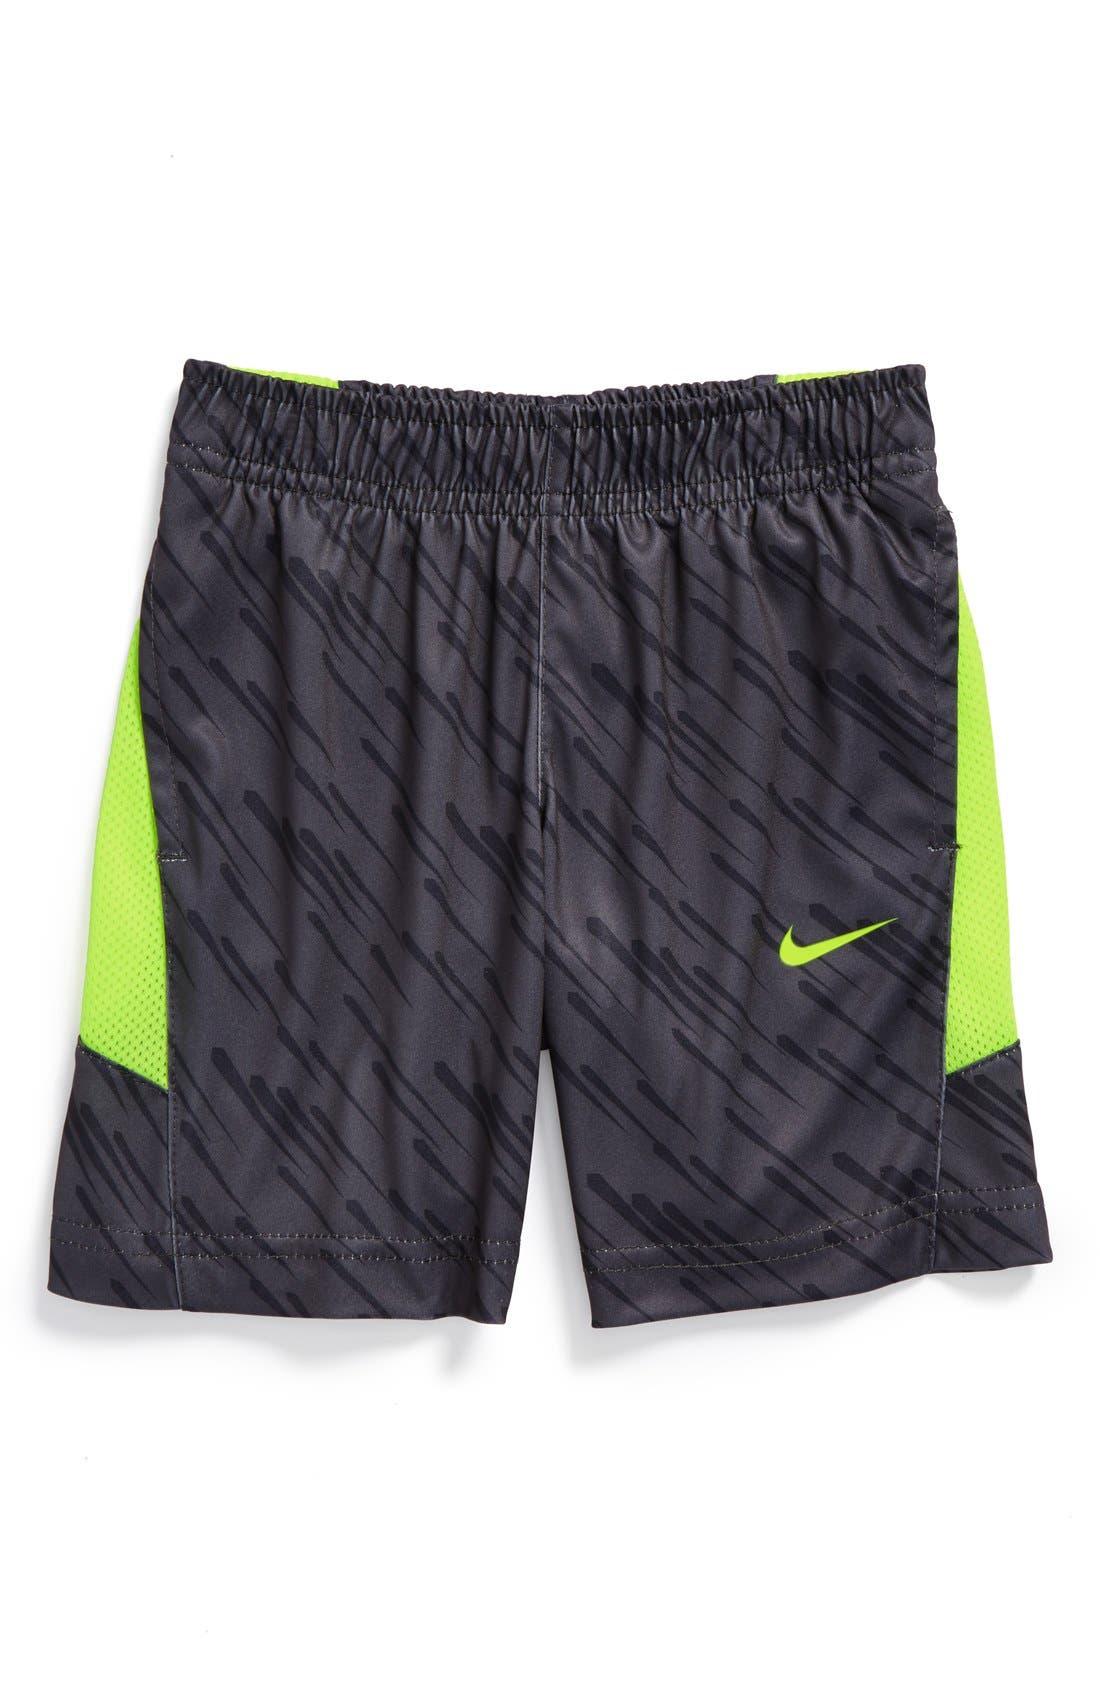 Alternate Image 1 Selected - Nike 'Speed GFX' Dri-FIT Shorts (Toddler Boys)